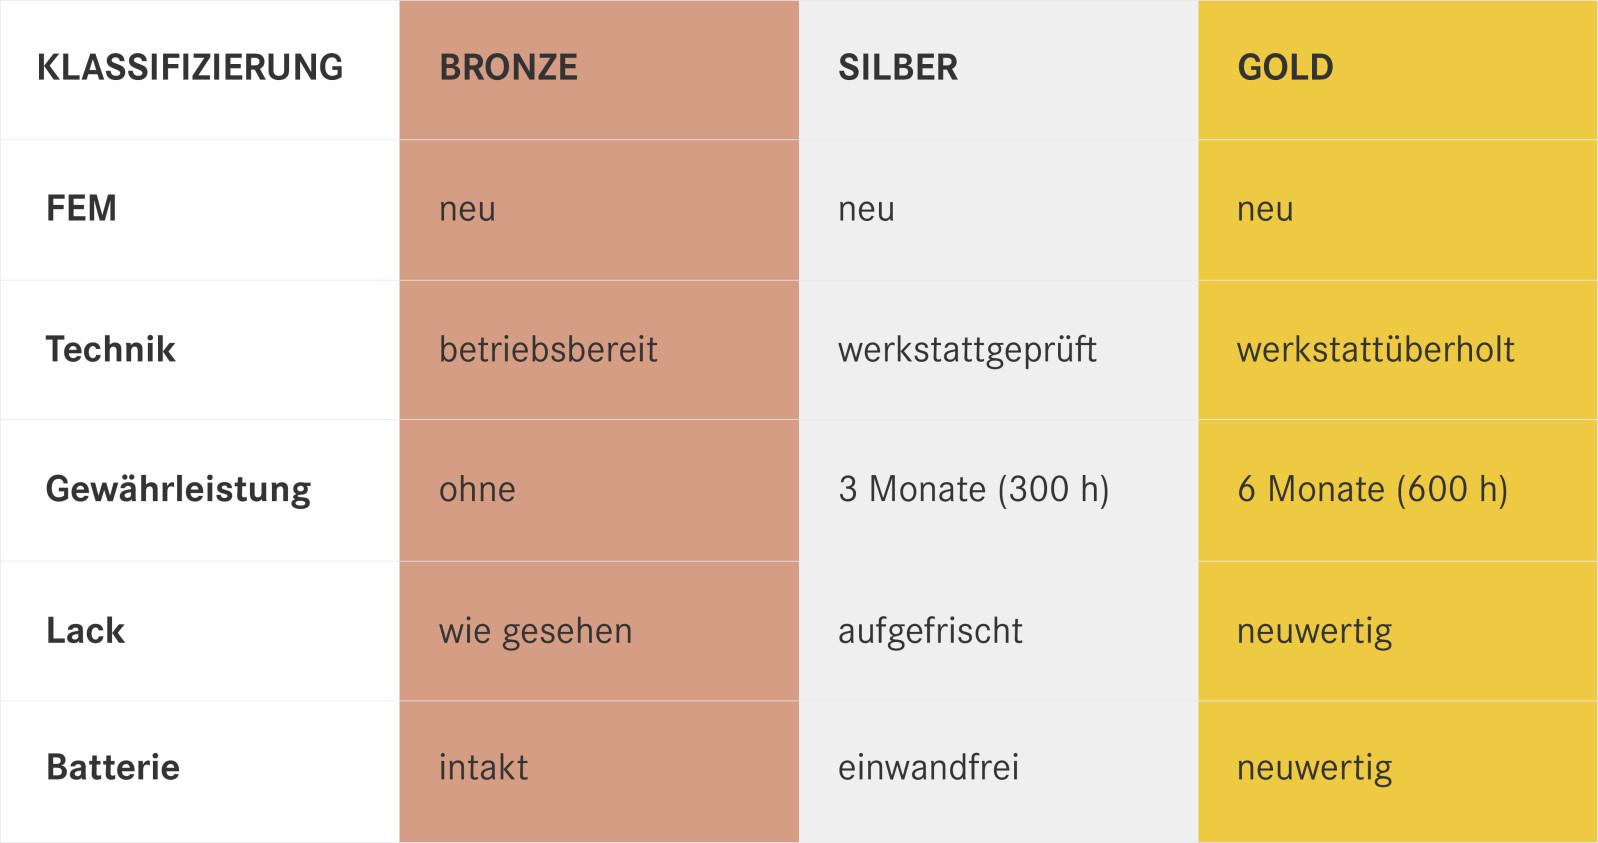 GG Klassifizierung-Tabelle